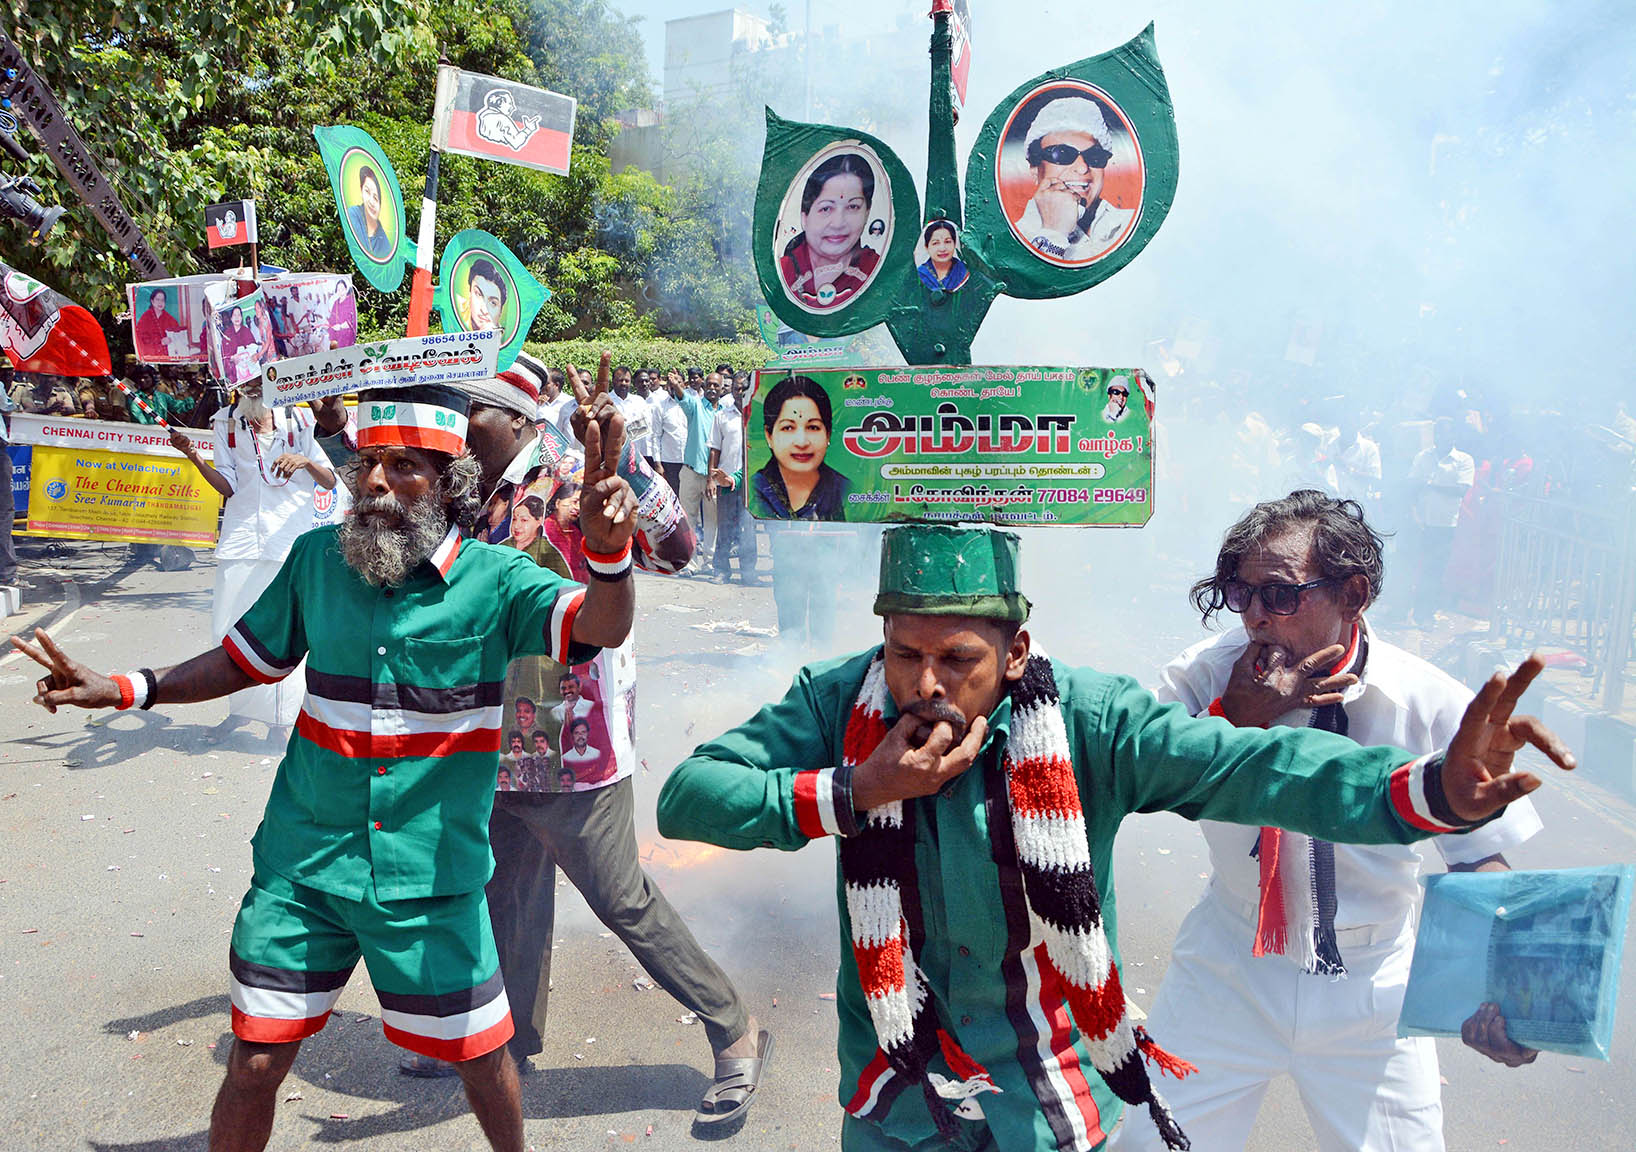 Supporters of India's All India Anna Dravida Munnetra Kazhagam (AIADMK)